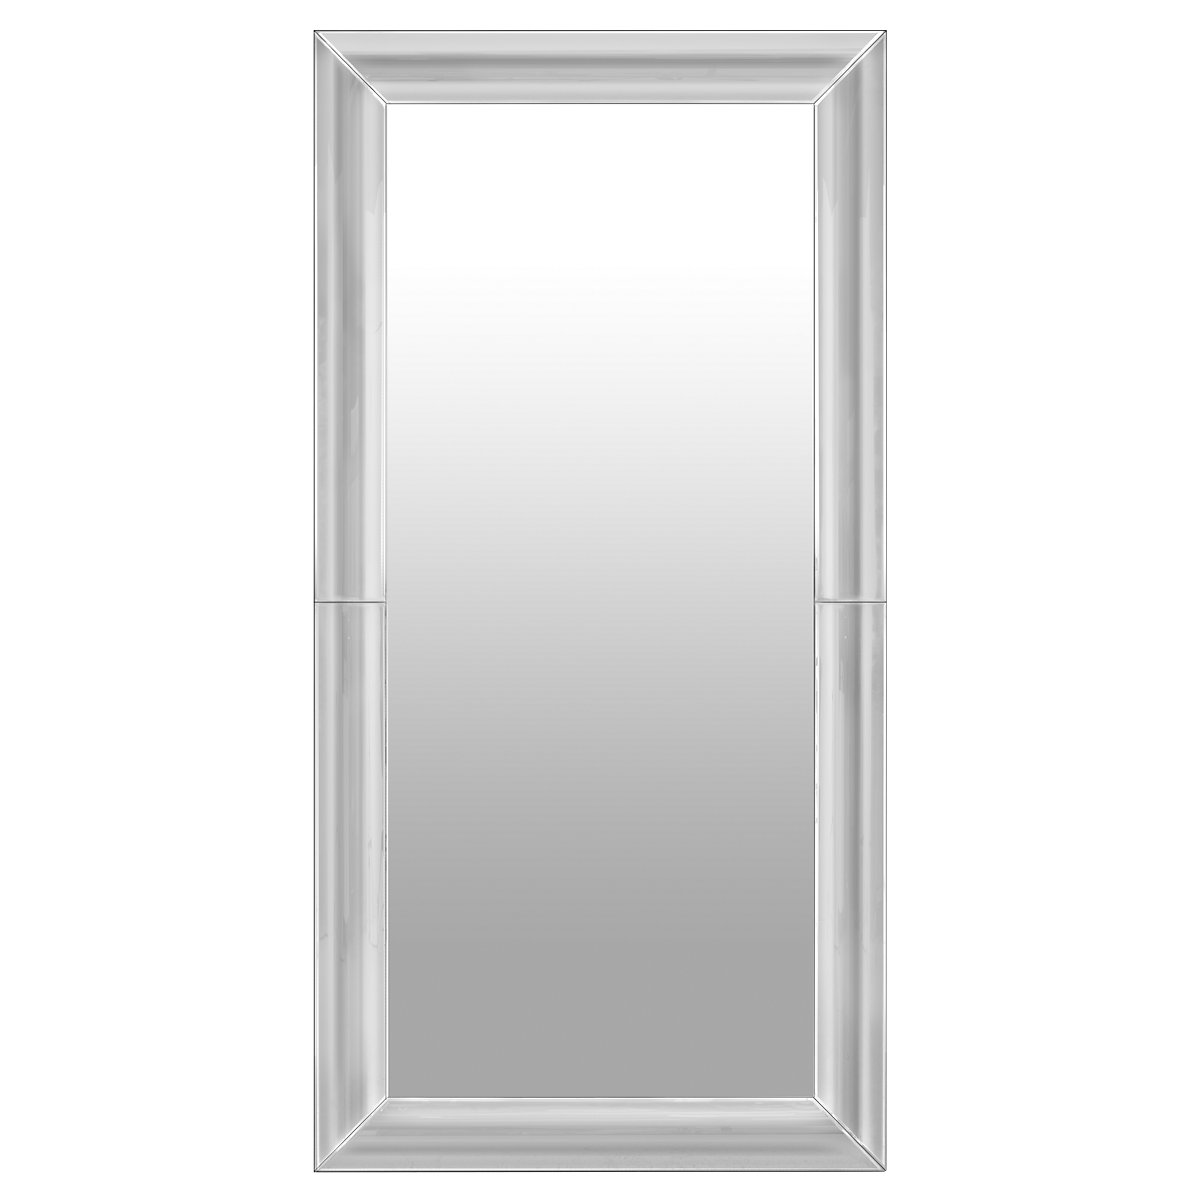 Amarie Silver Floor Mirror